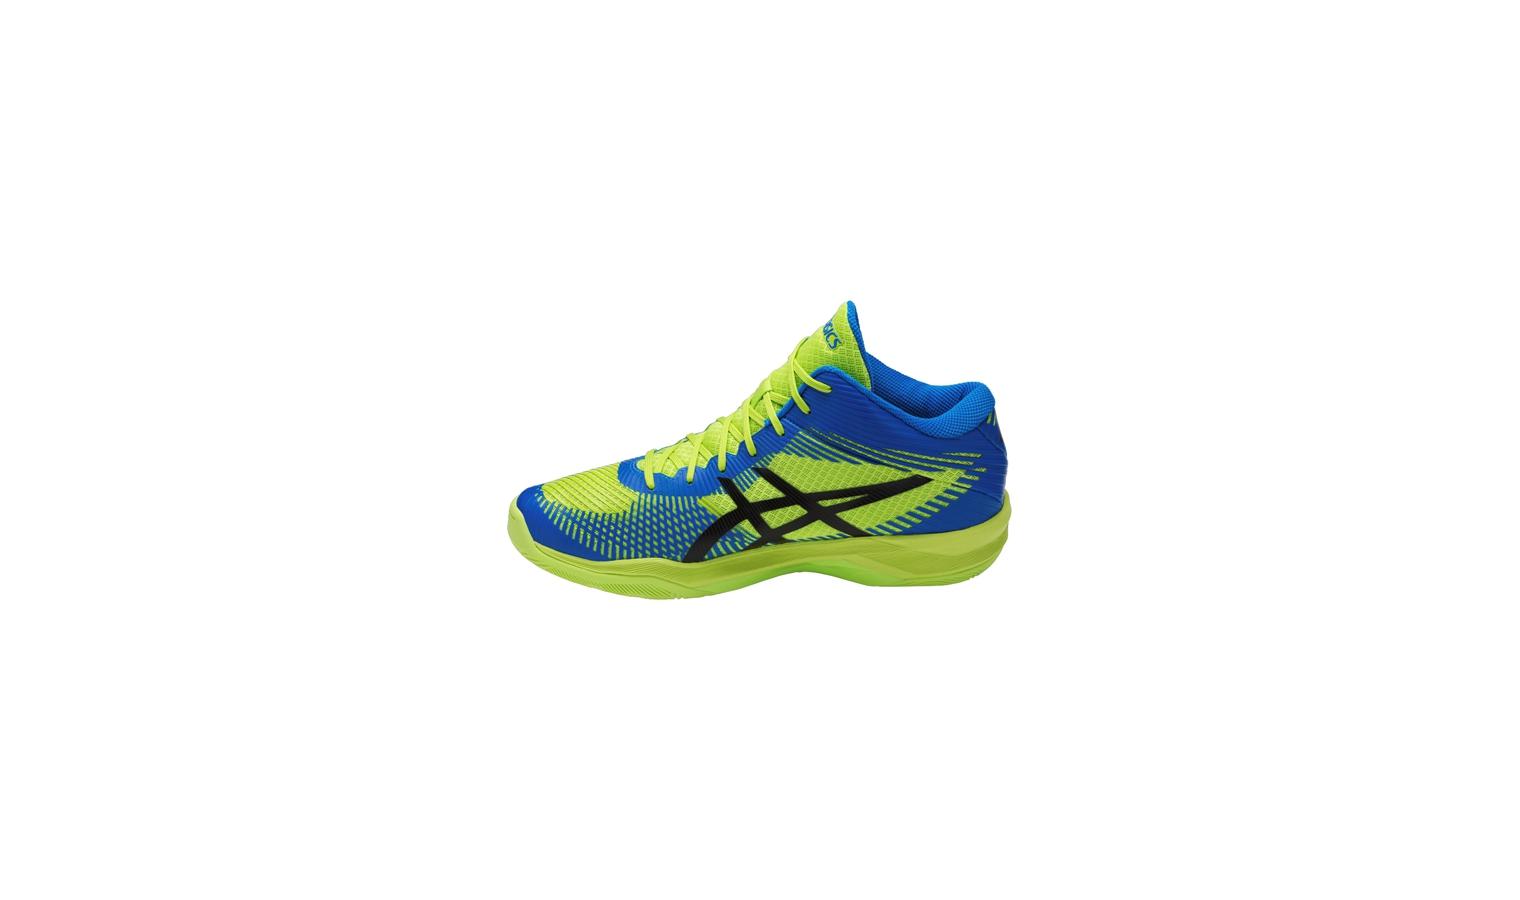 ... Pánské volejbalové boty Asics VOLLEY ELITE FF MT modré. 0 Kč Sleva b29f8ab5608